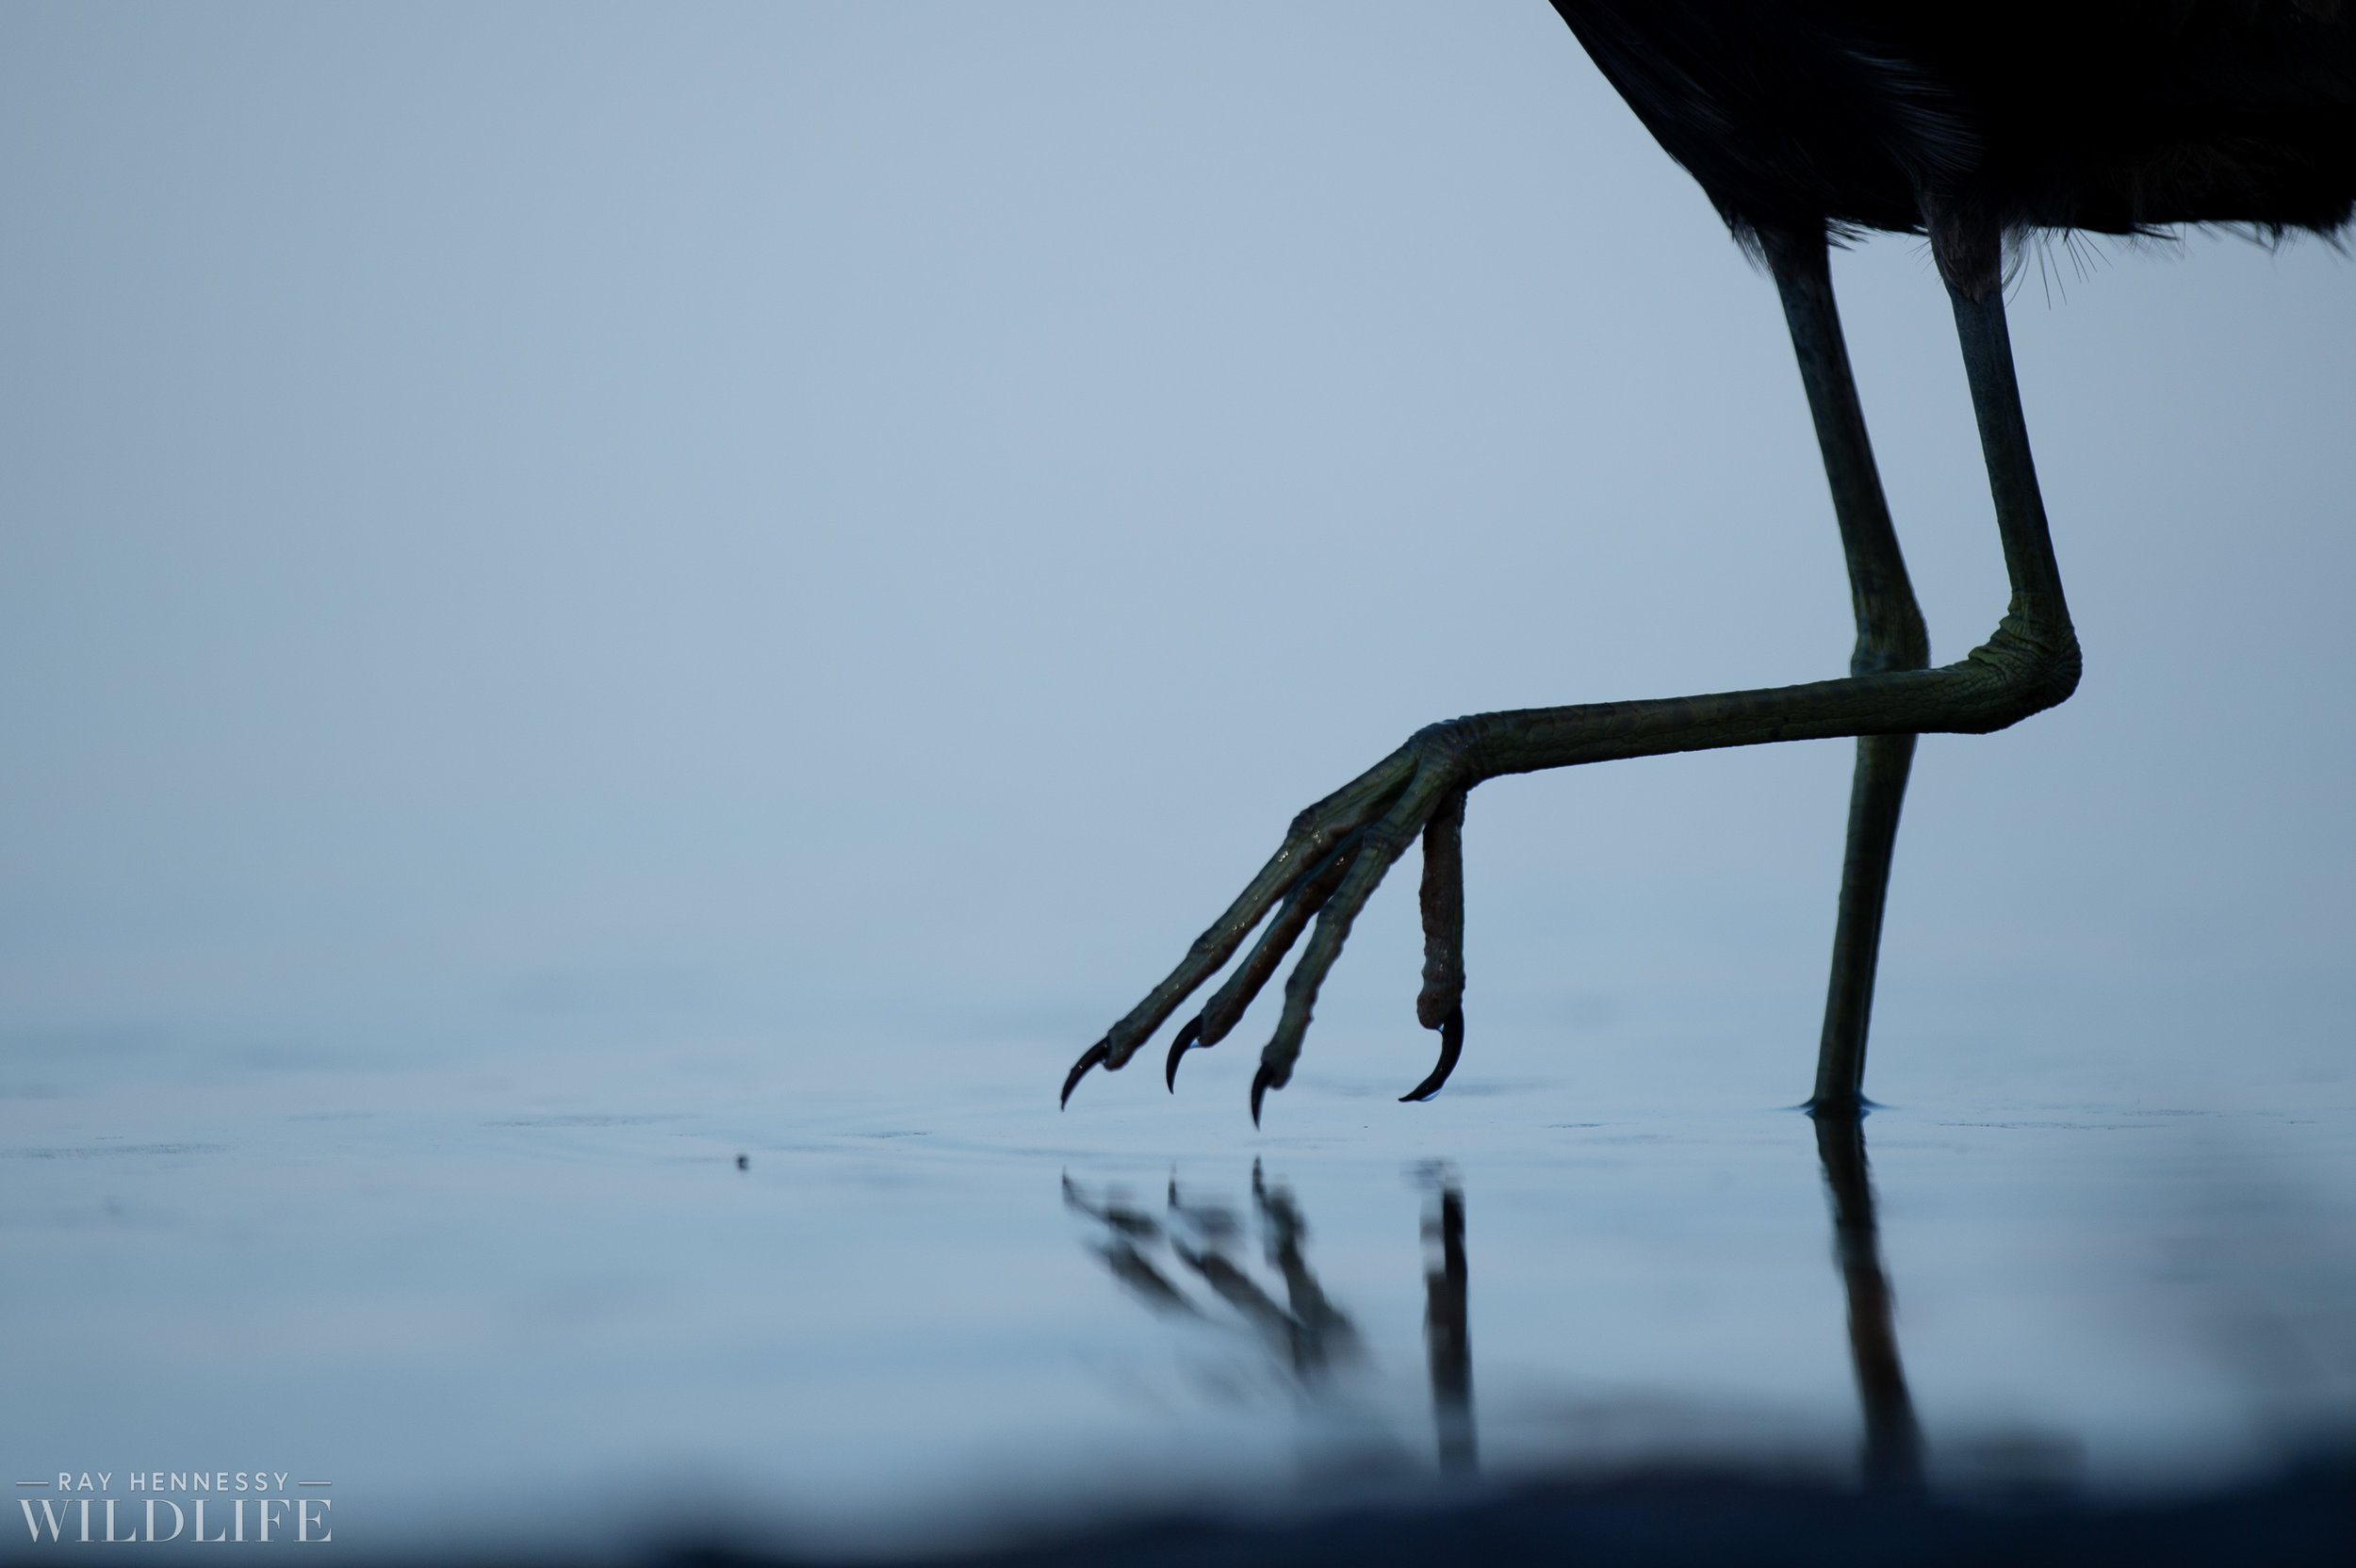 010_burrowing-owls-blue-heron-florida.jpg